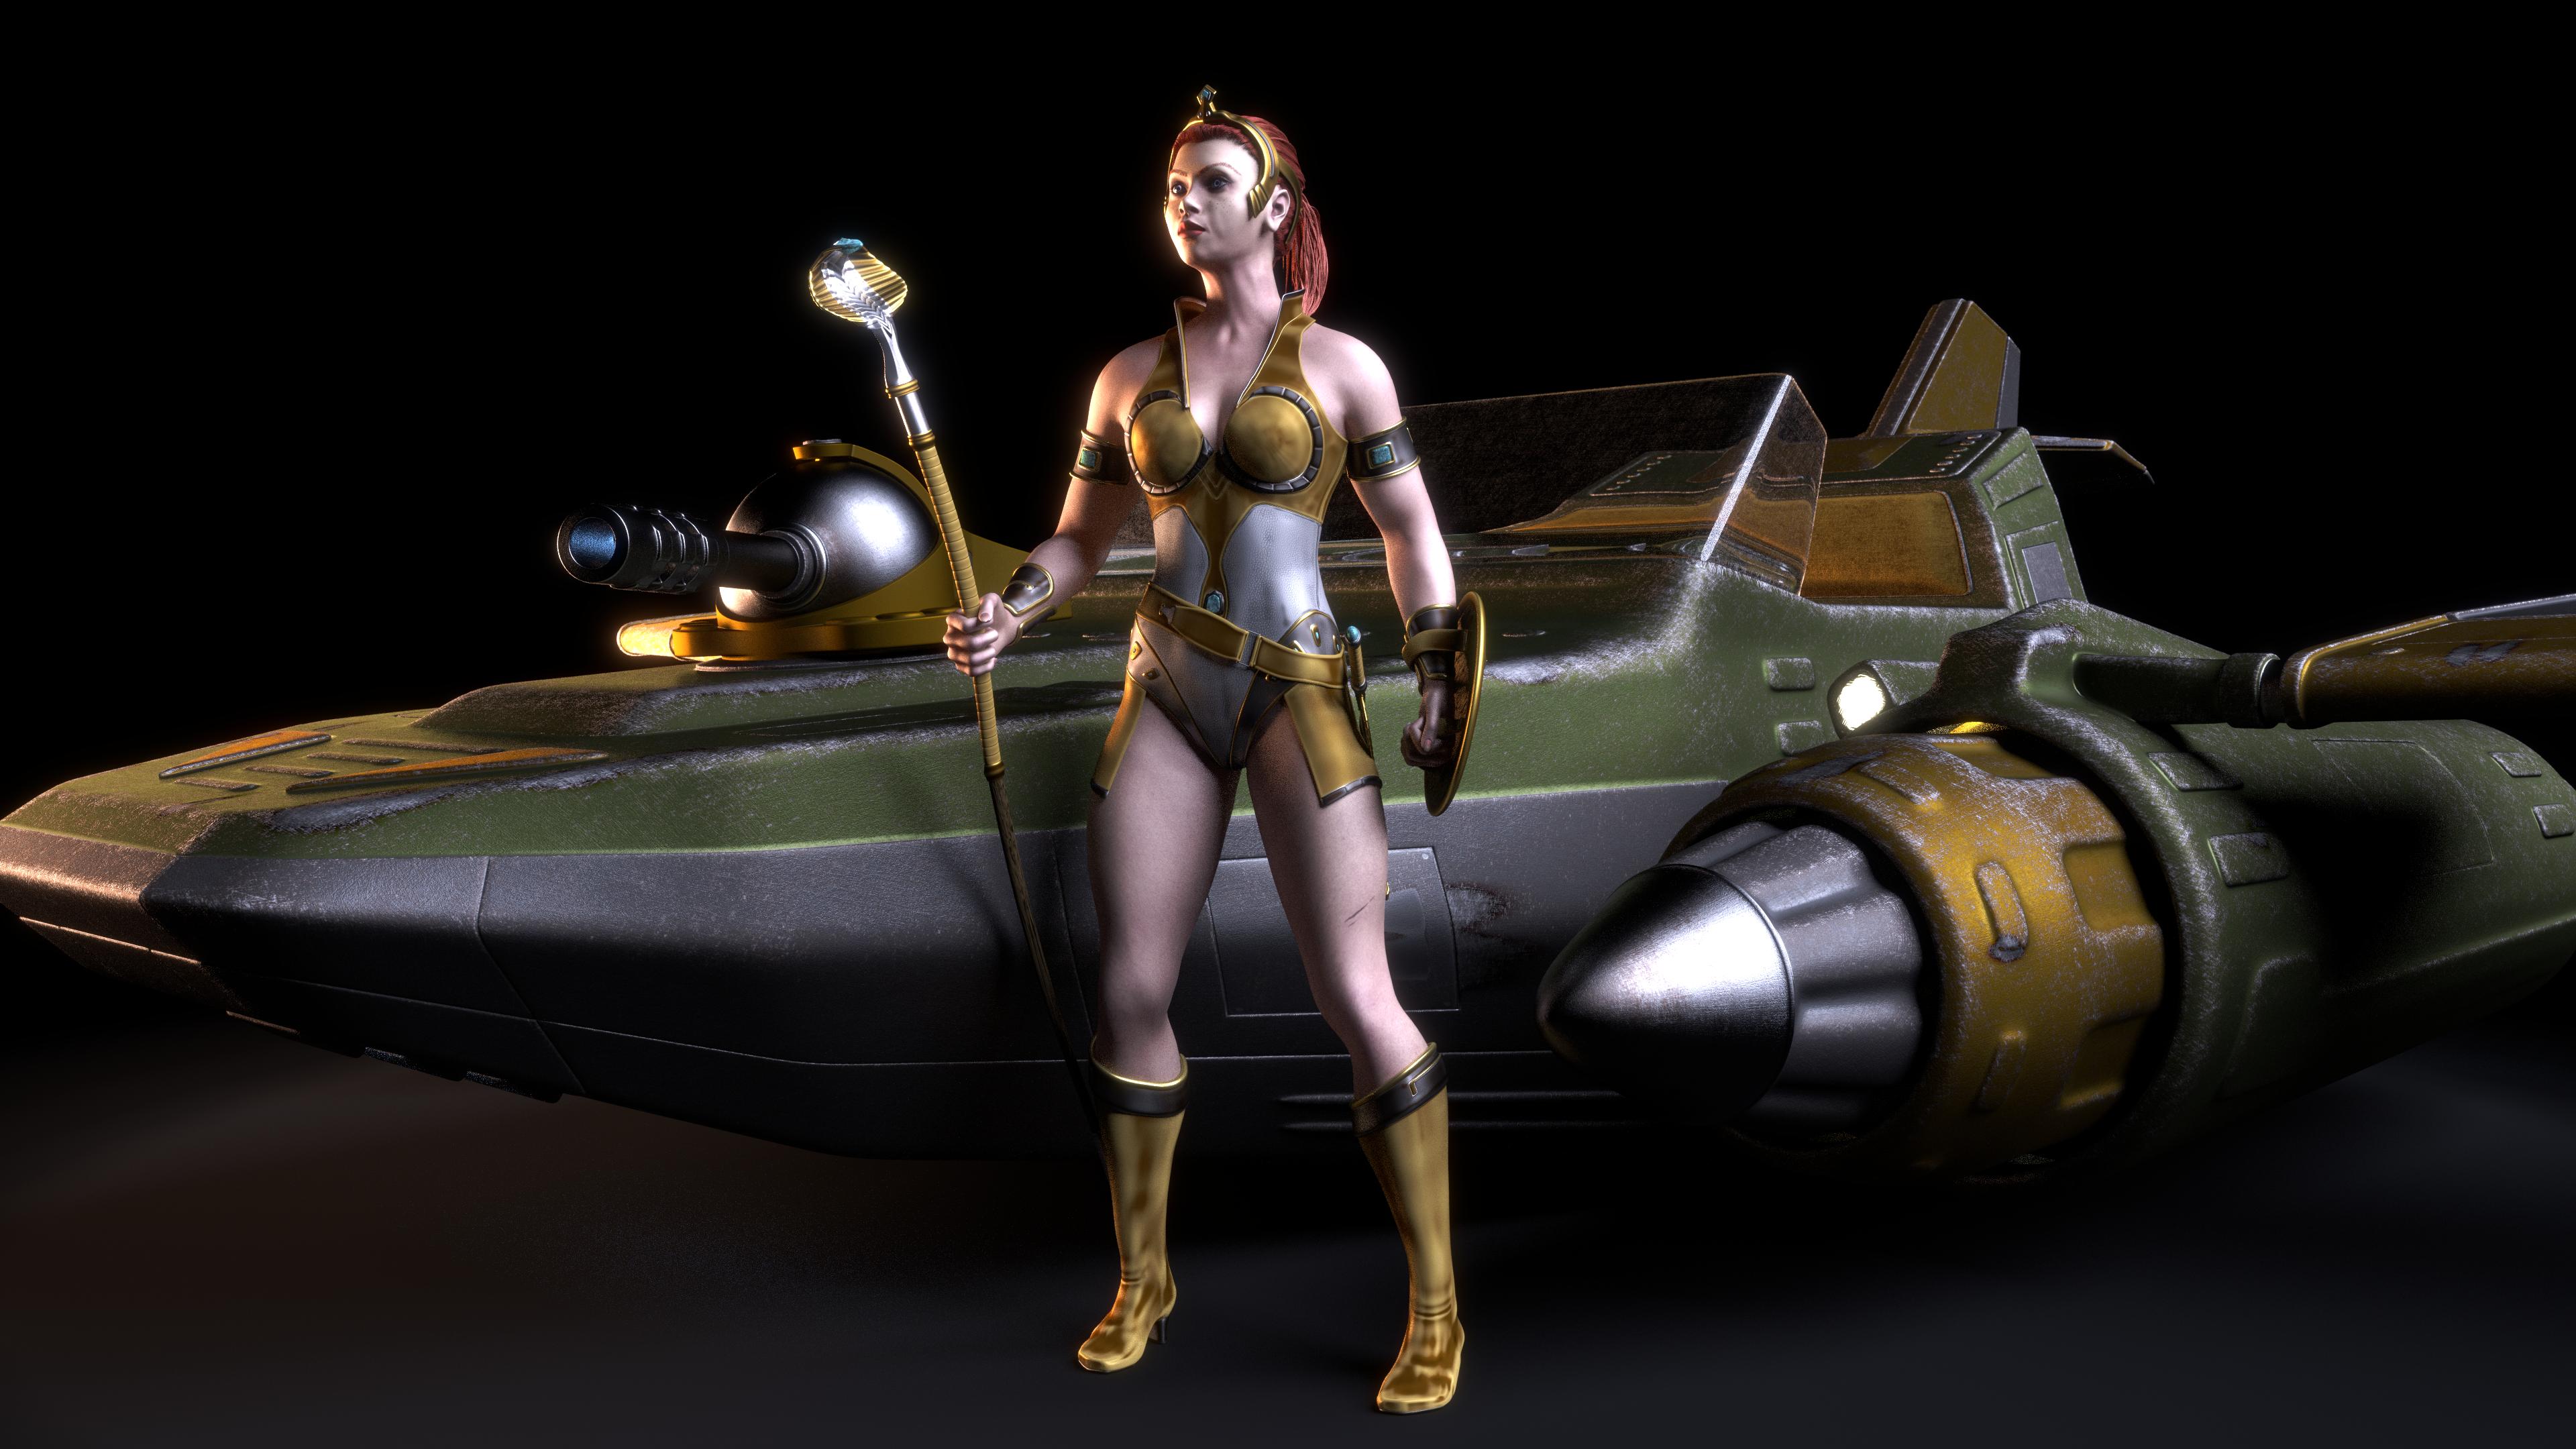 MOTU - Teela and the Wind Raider 2 by paulrich